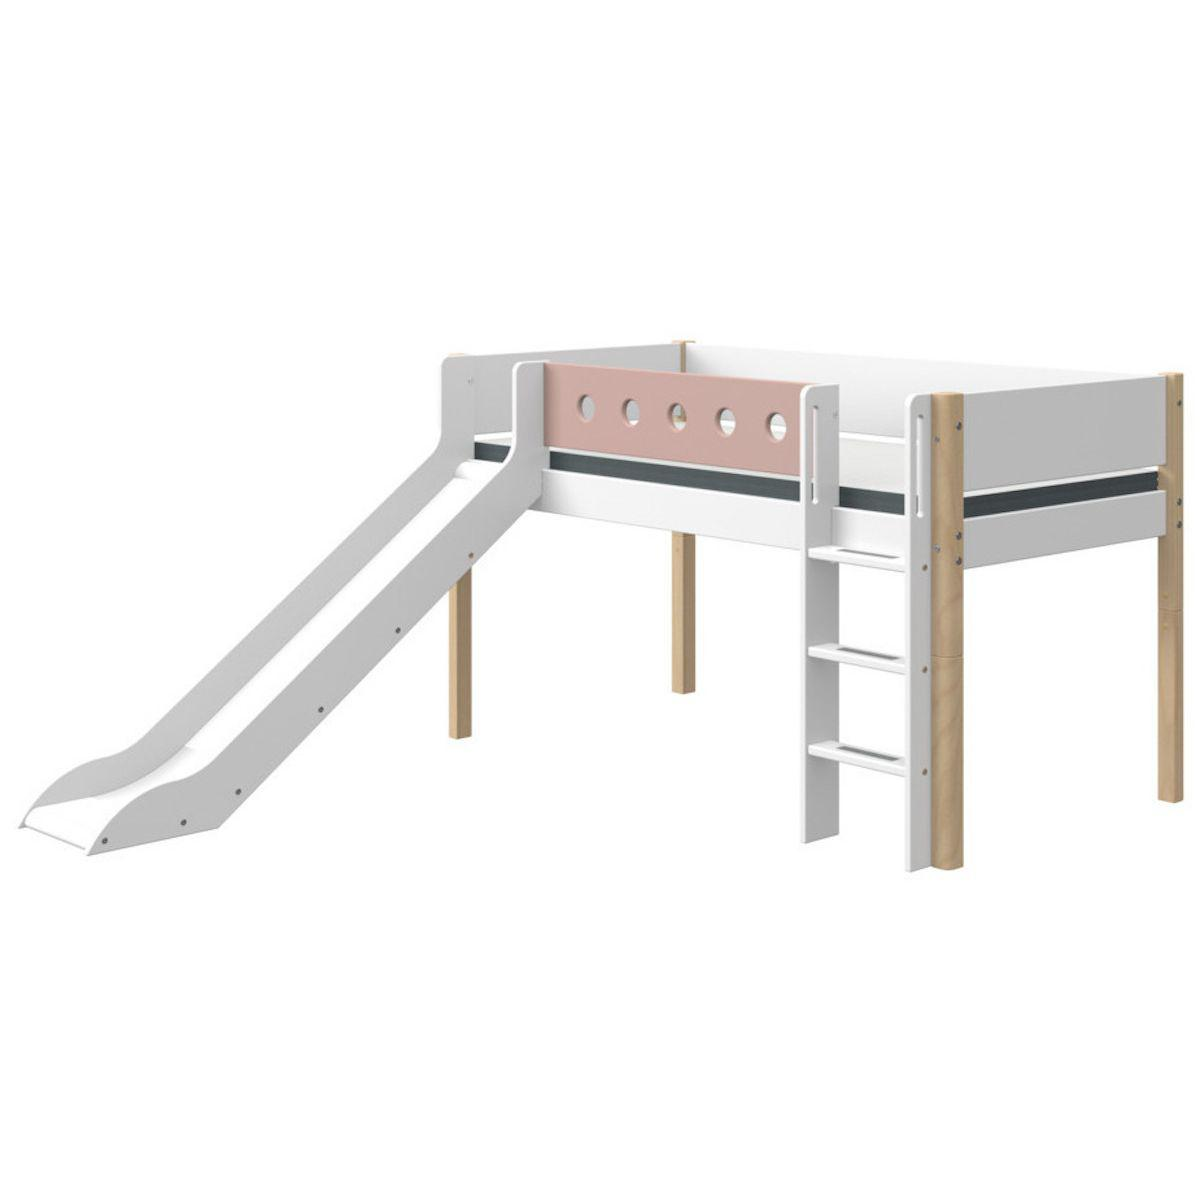 Cama media alta 90x200cm escalera recta-tobogán WHITE Flexa natural-rosa claro